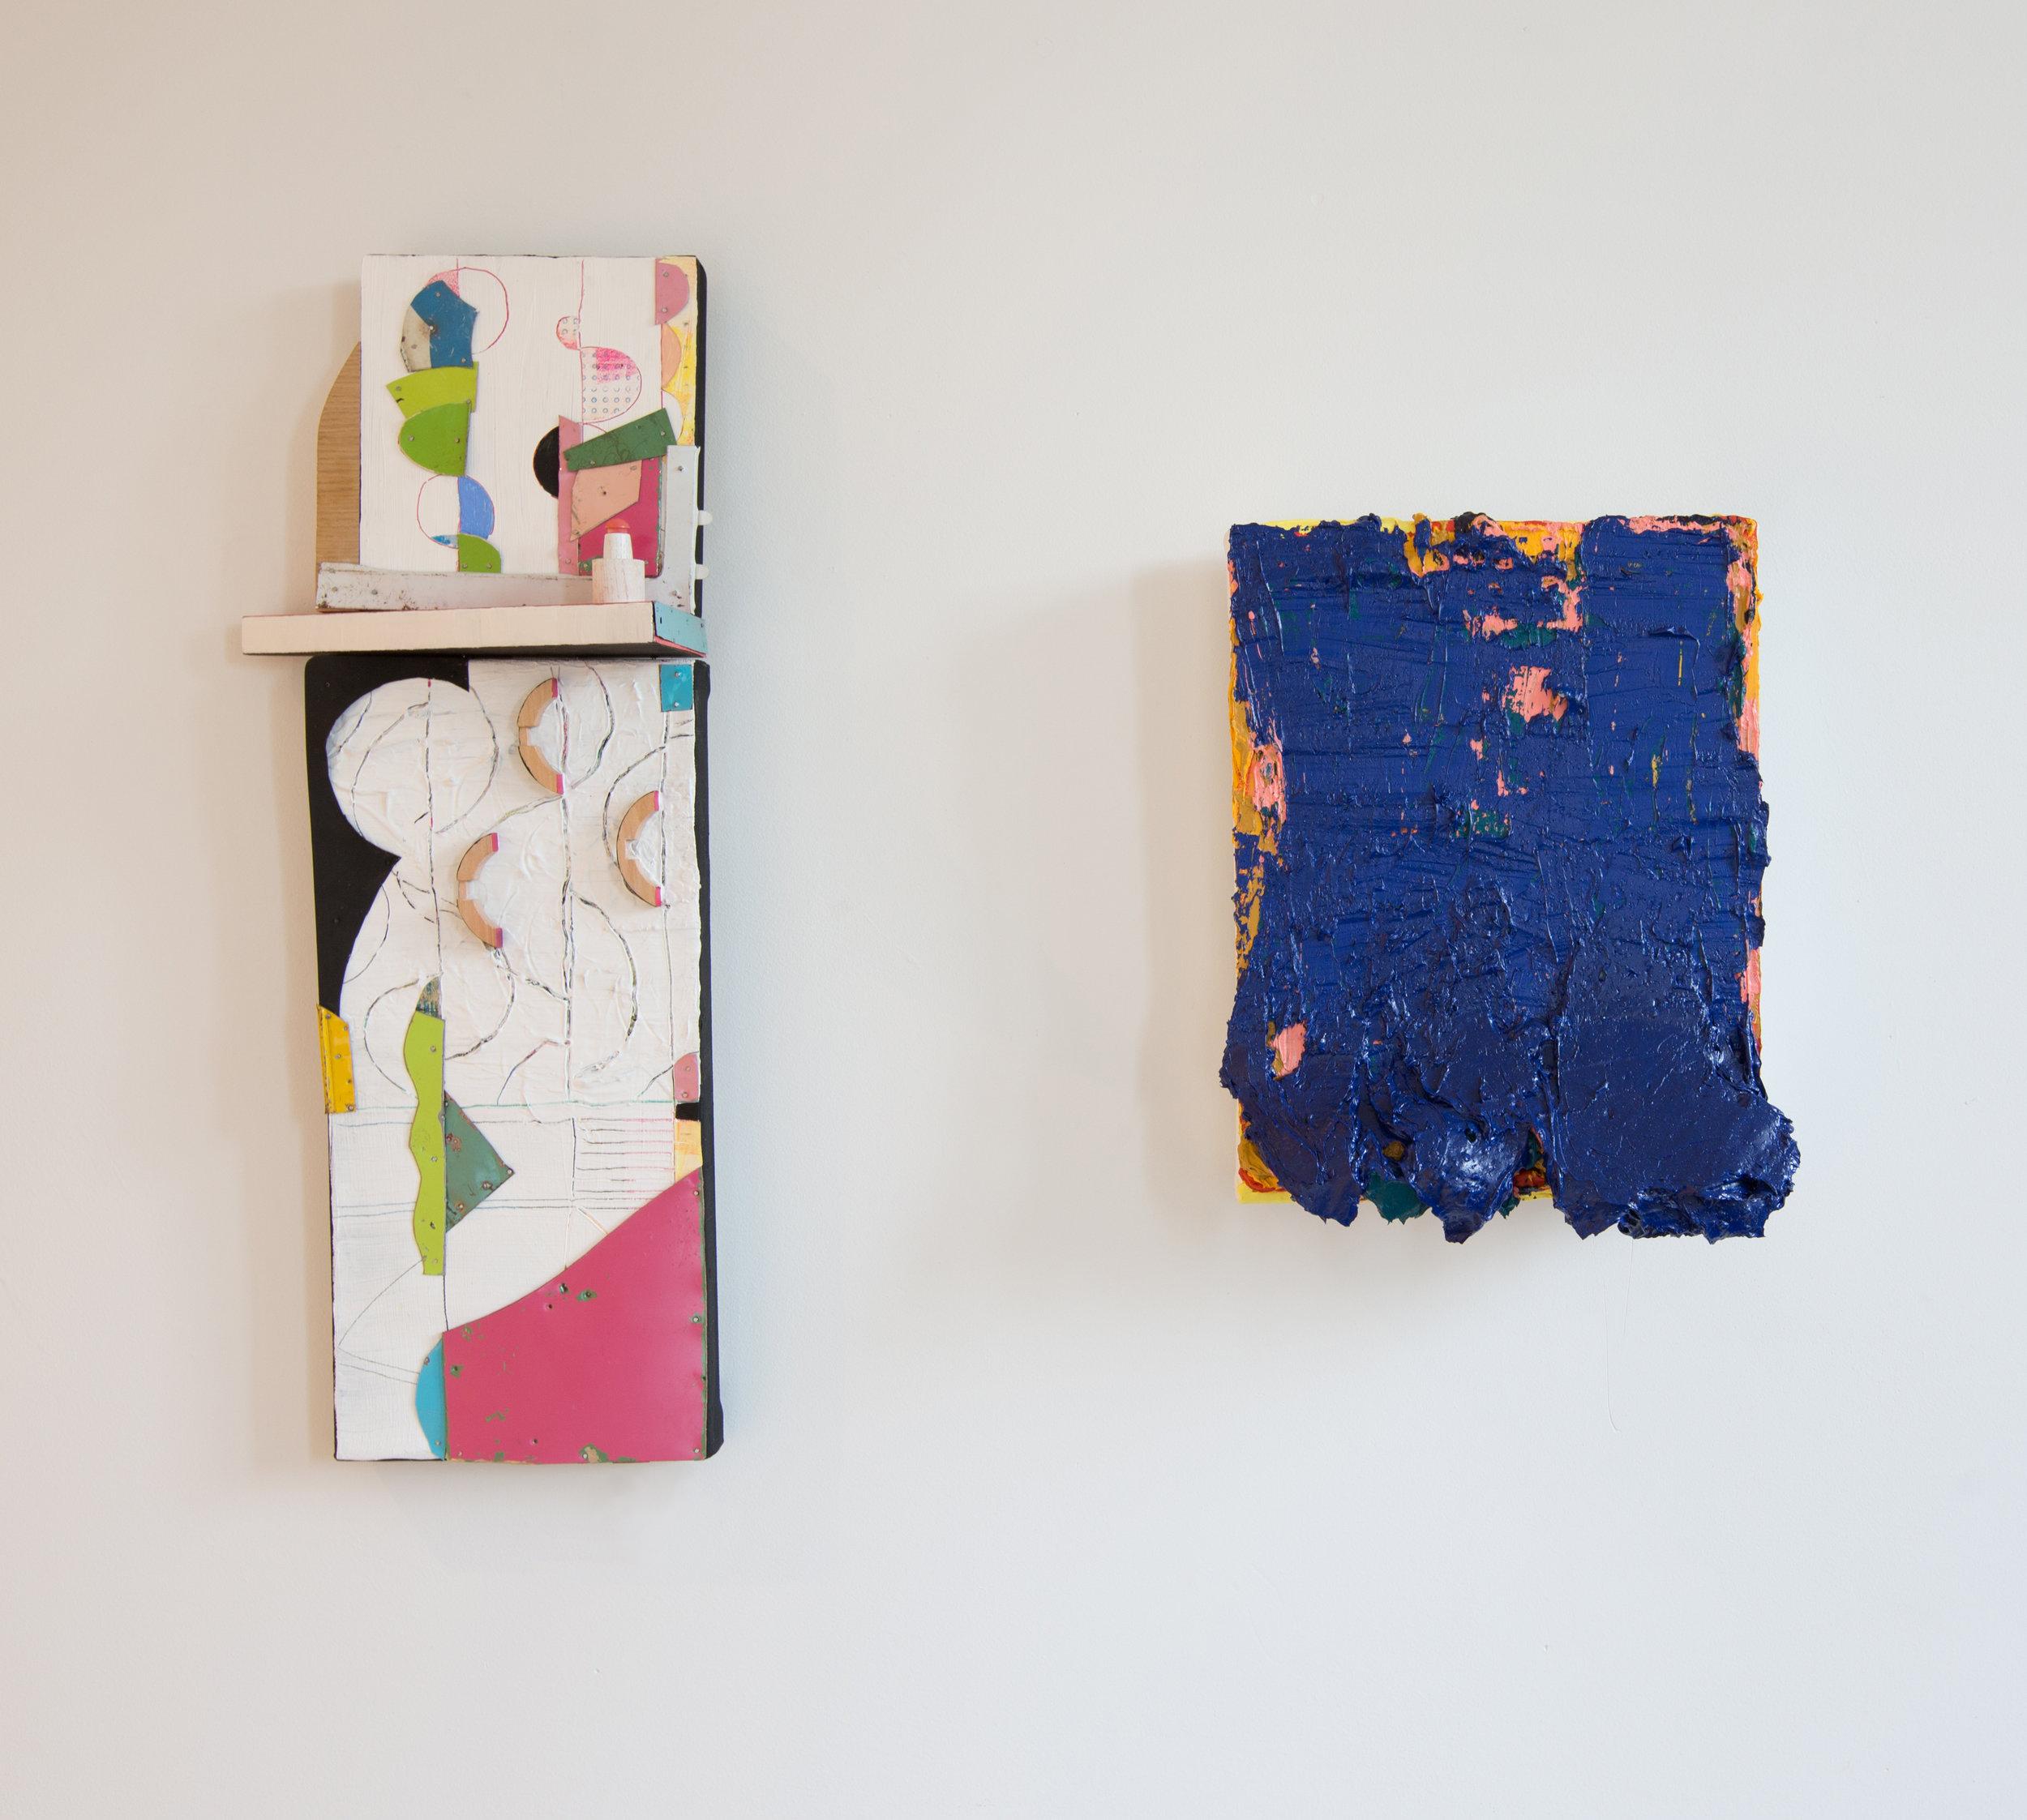 L: Elizabeth Arzani, R: Joshua Thompson